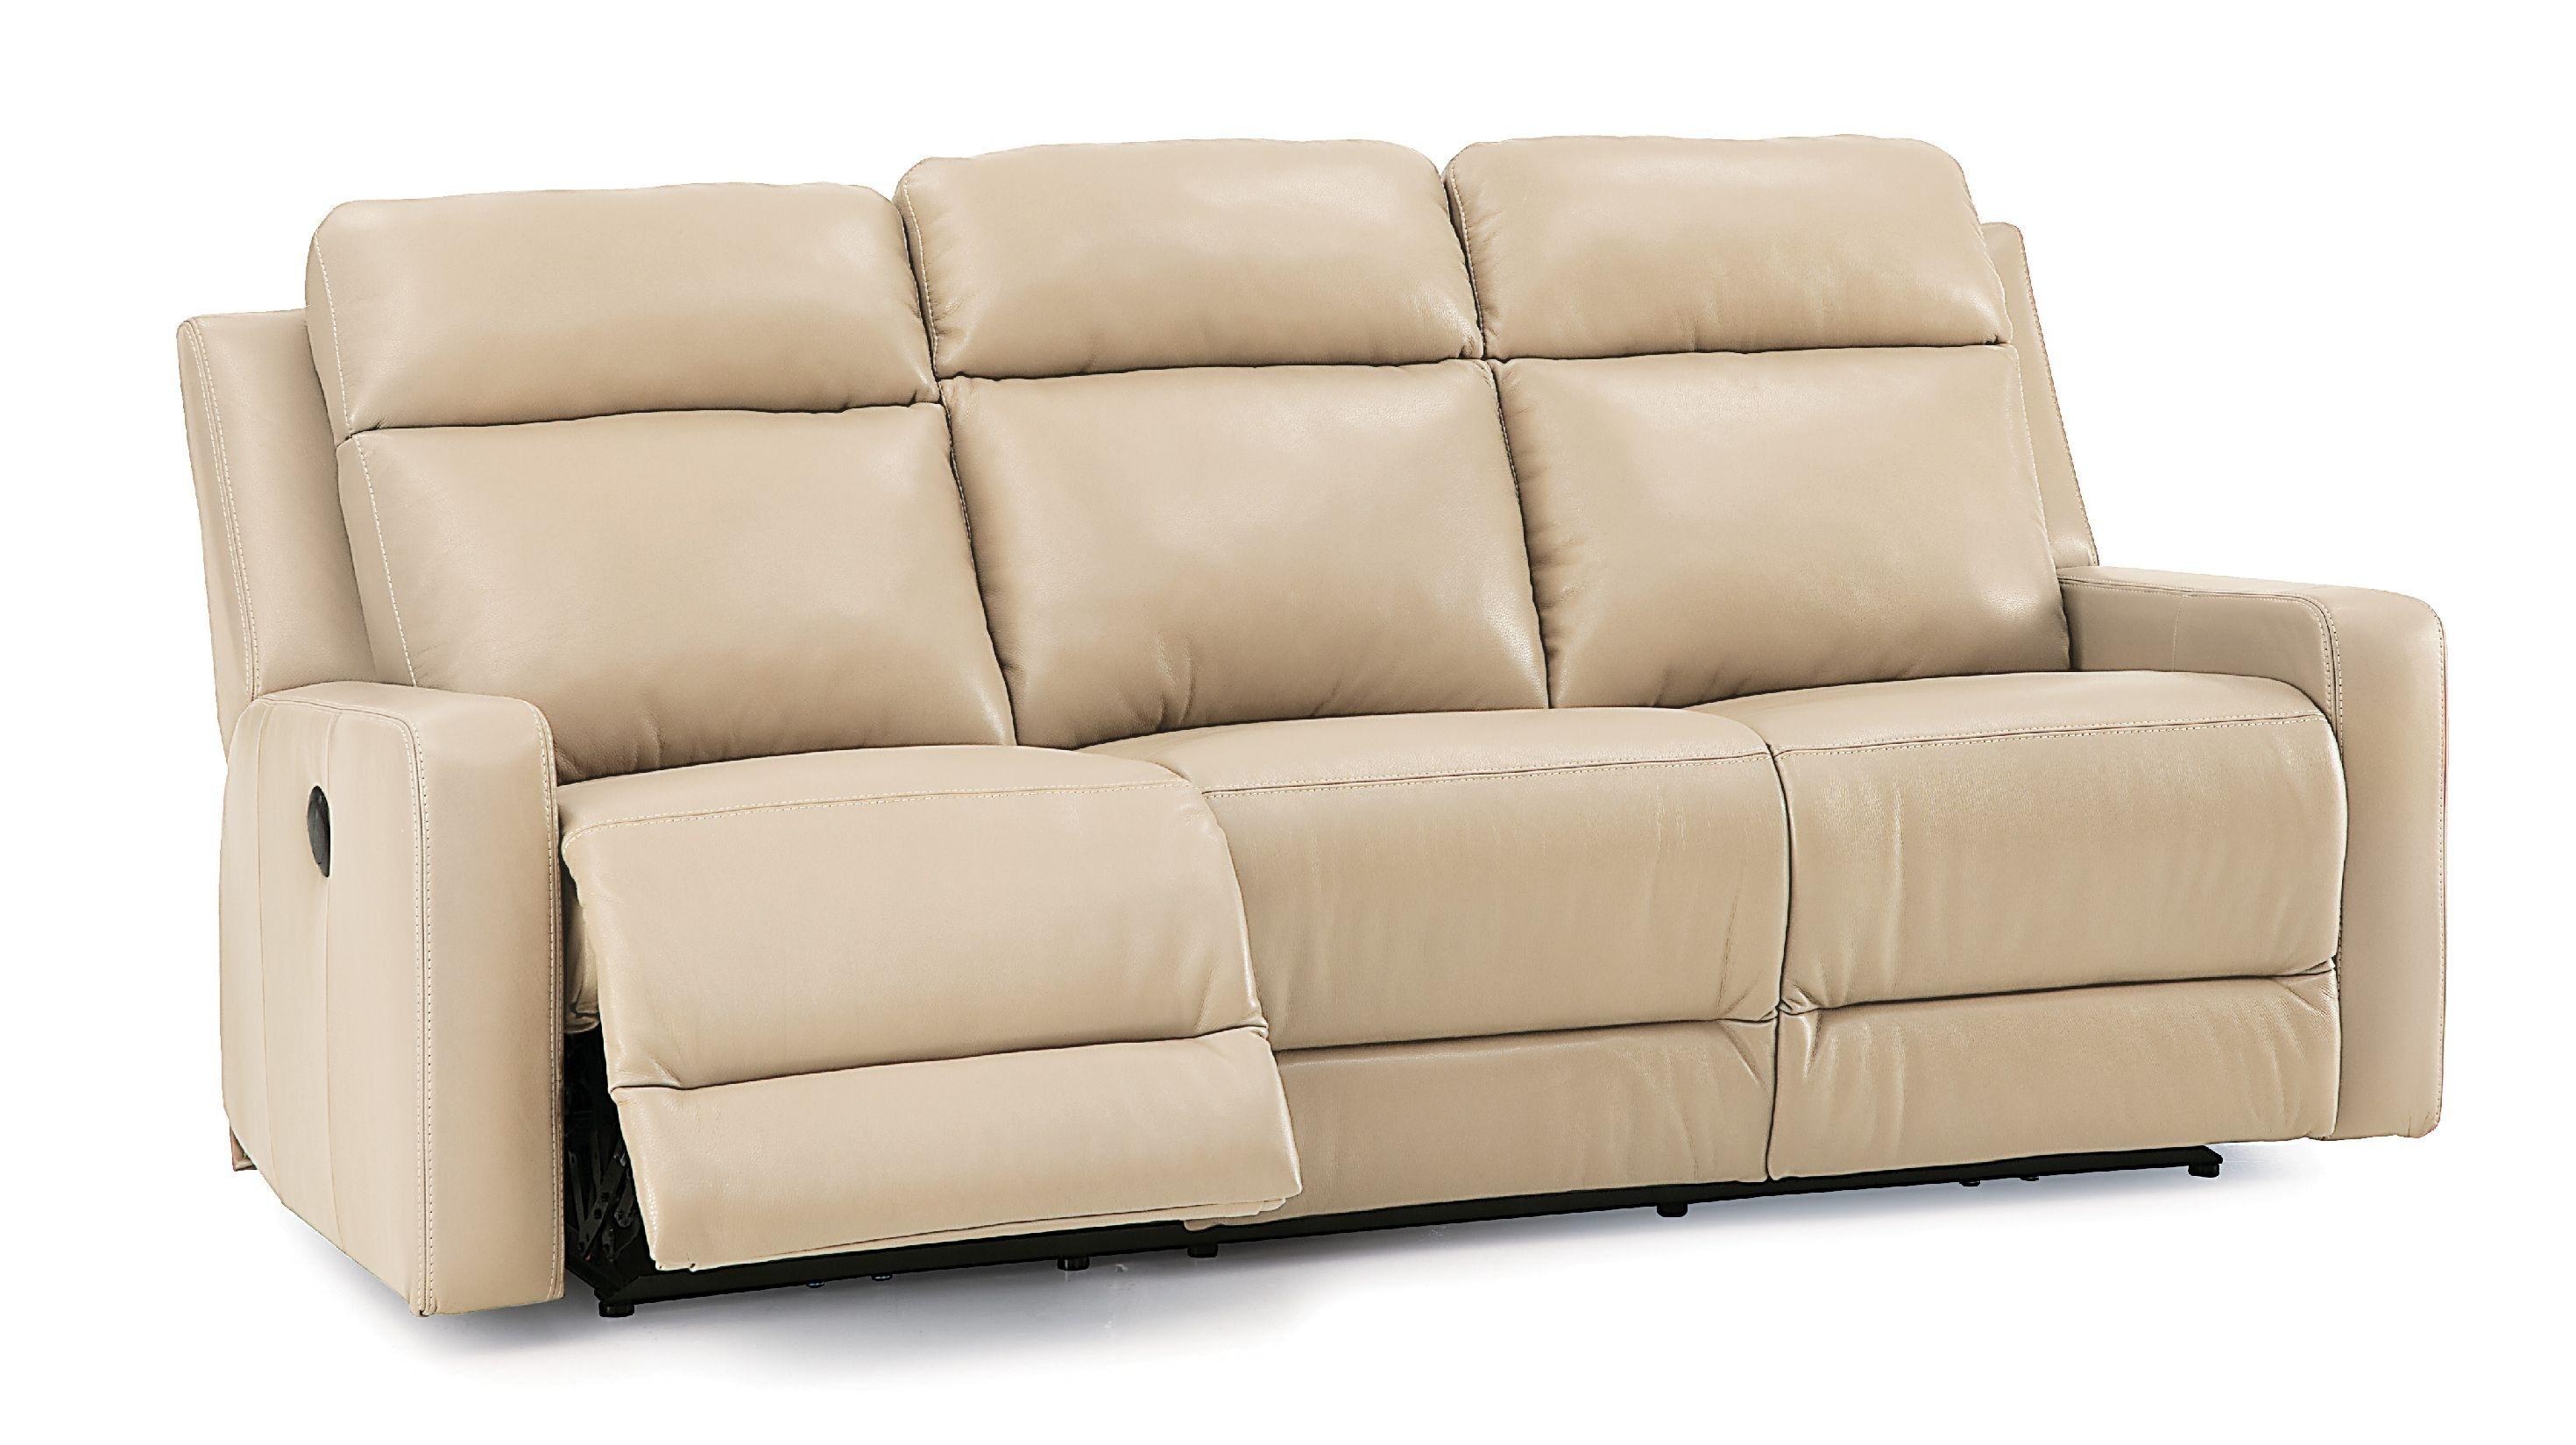 Palliser Furniture Living Room Sofa Recliner 41032-51 - Haynes Brothers - Volusia County